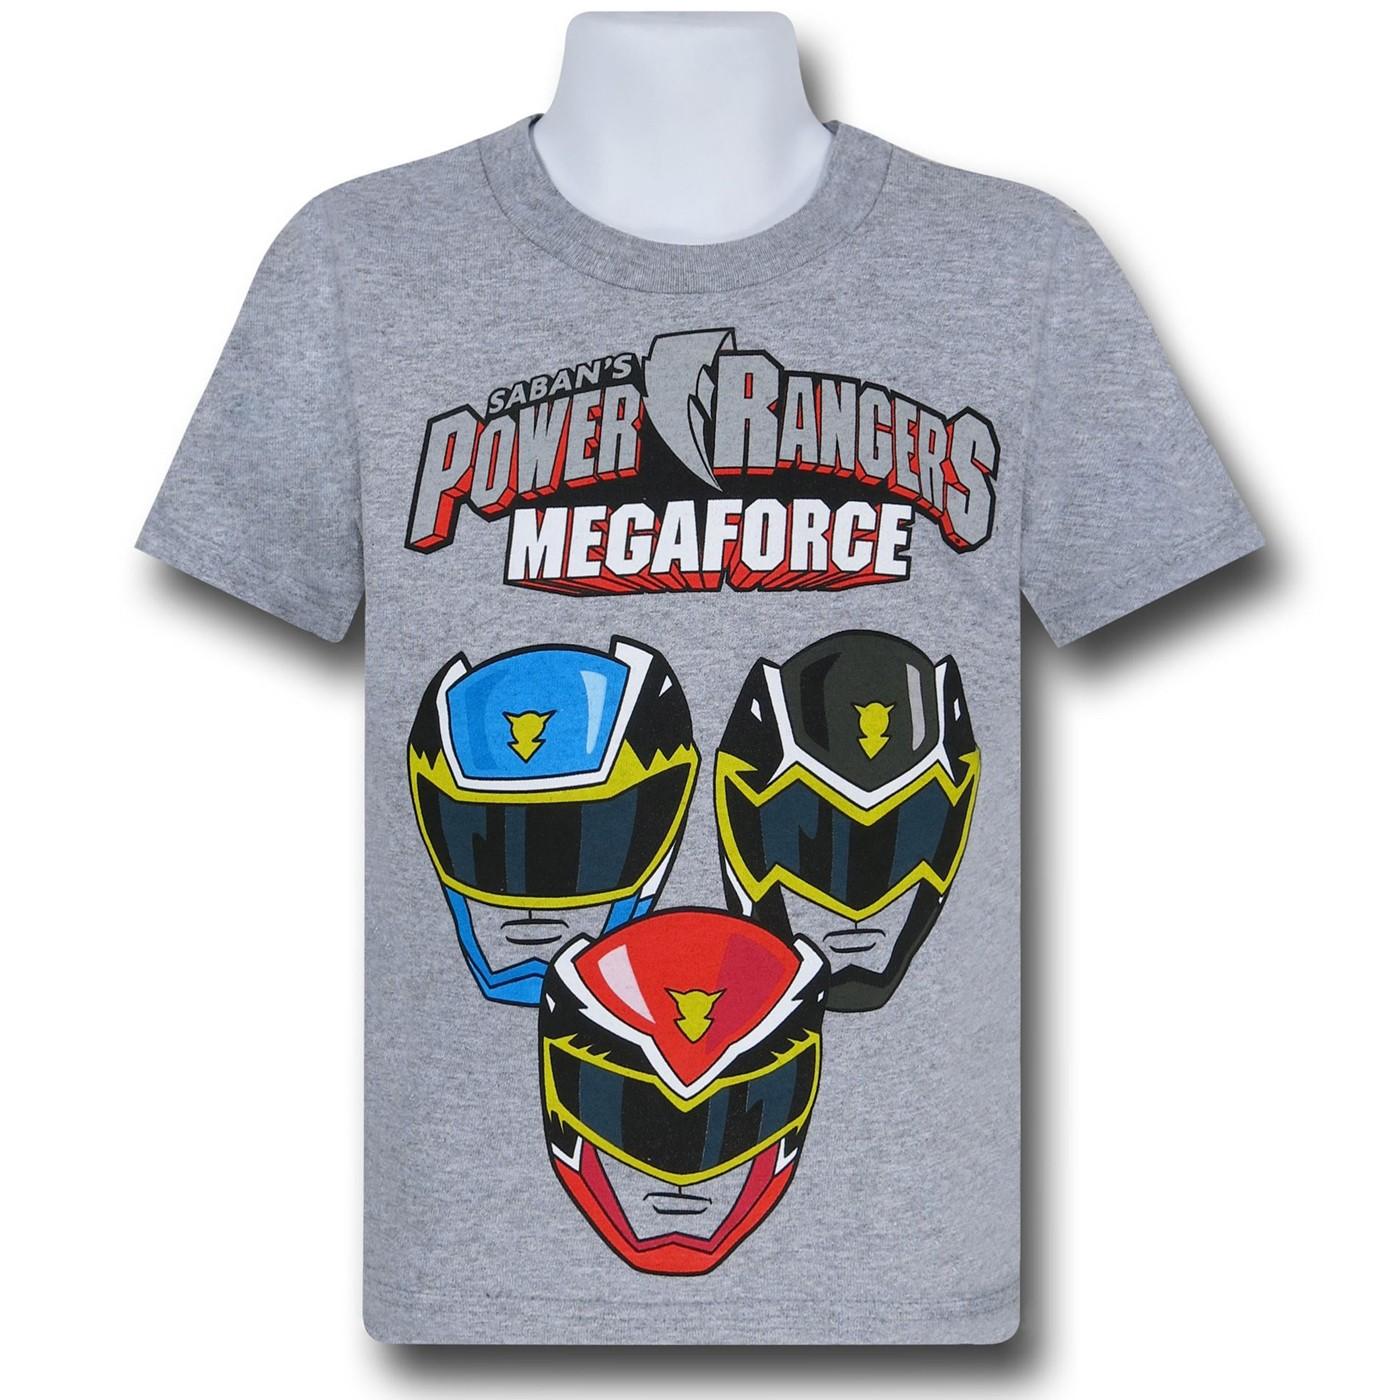 Power Rangers MegaForce Helmet Kids T-Shirt